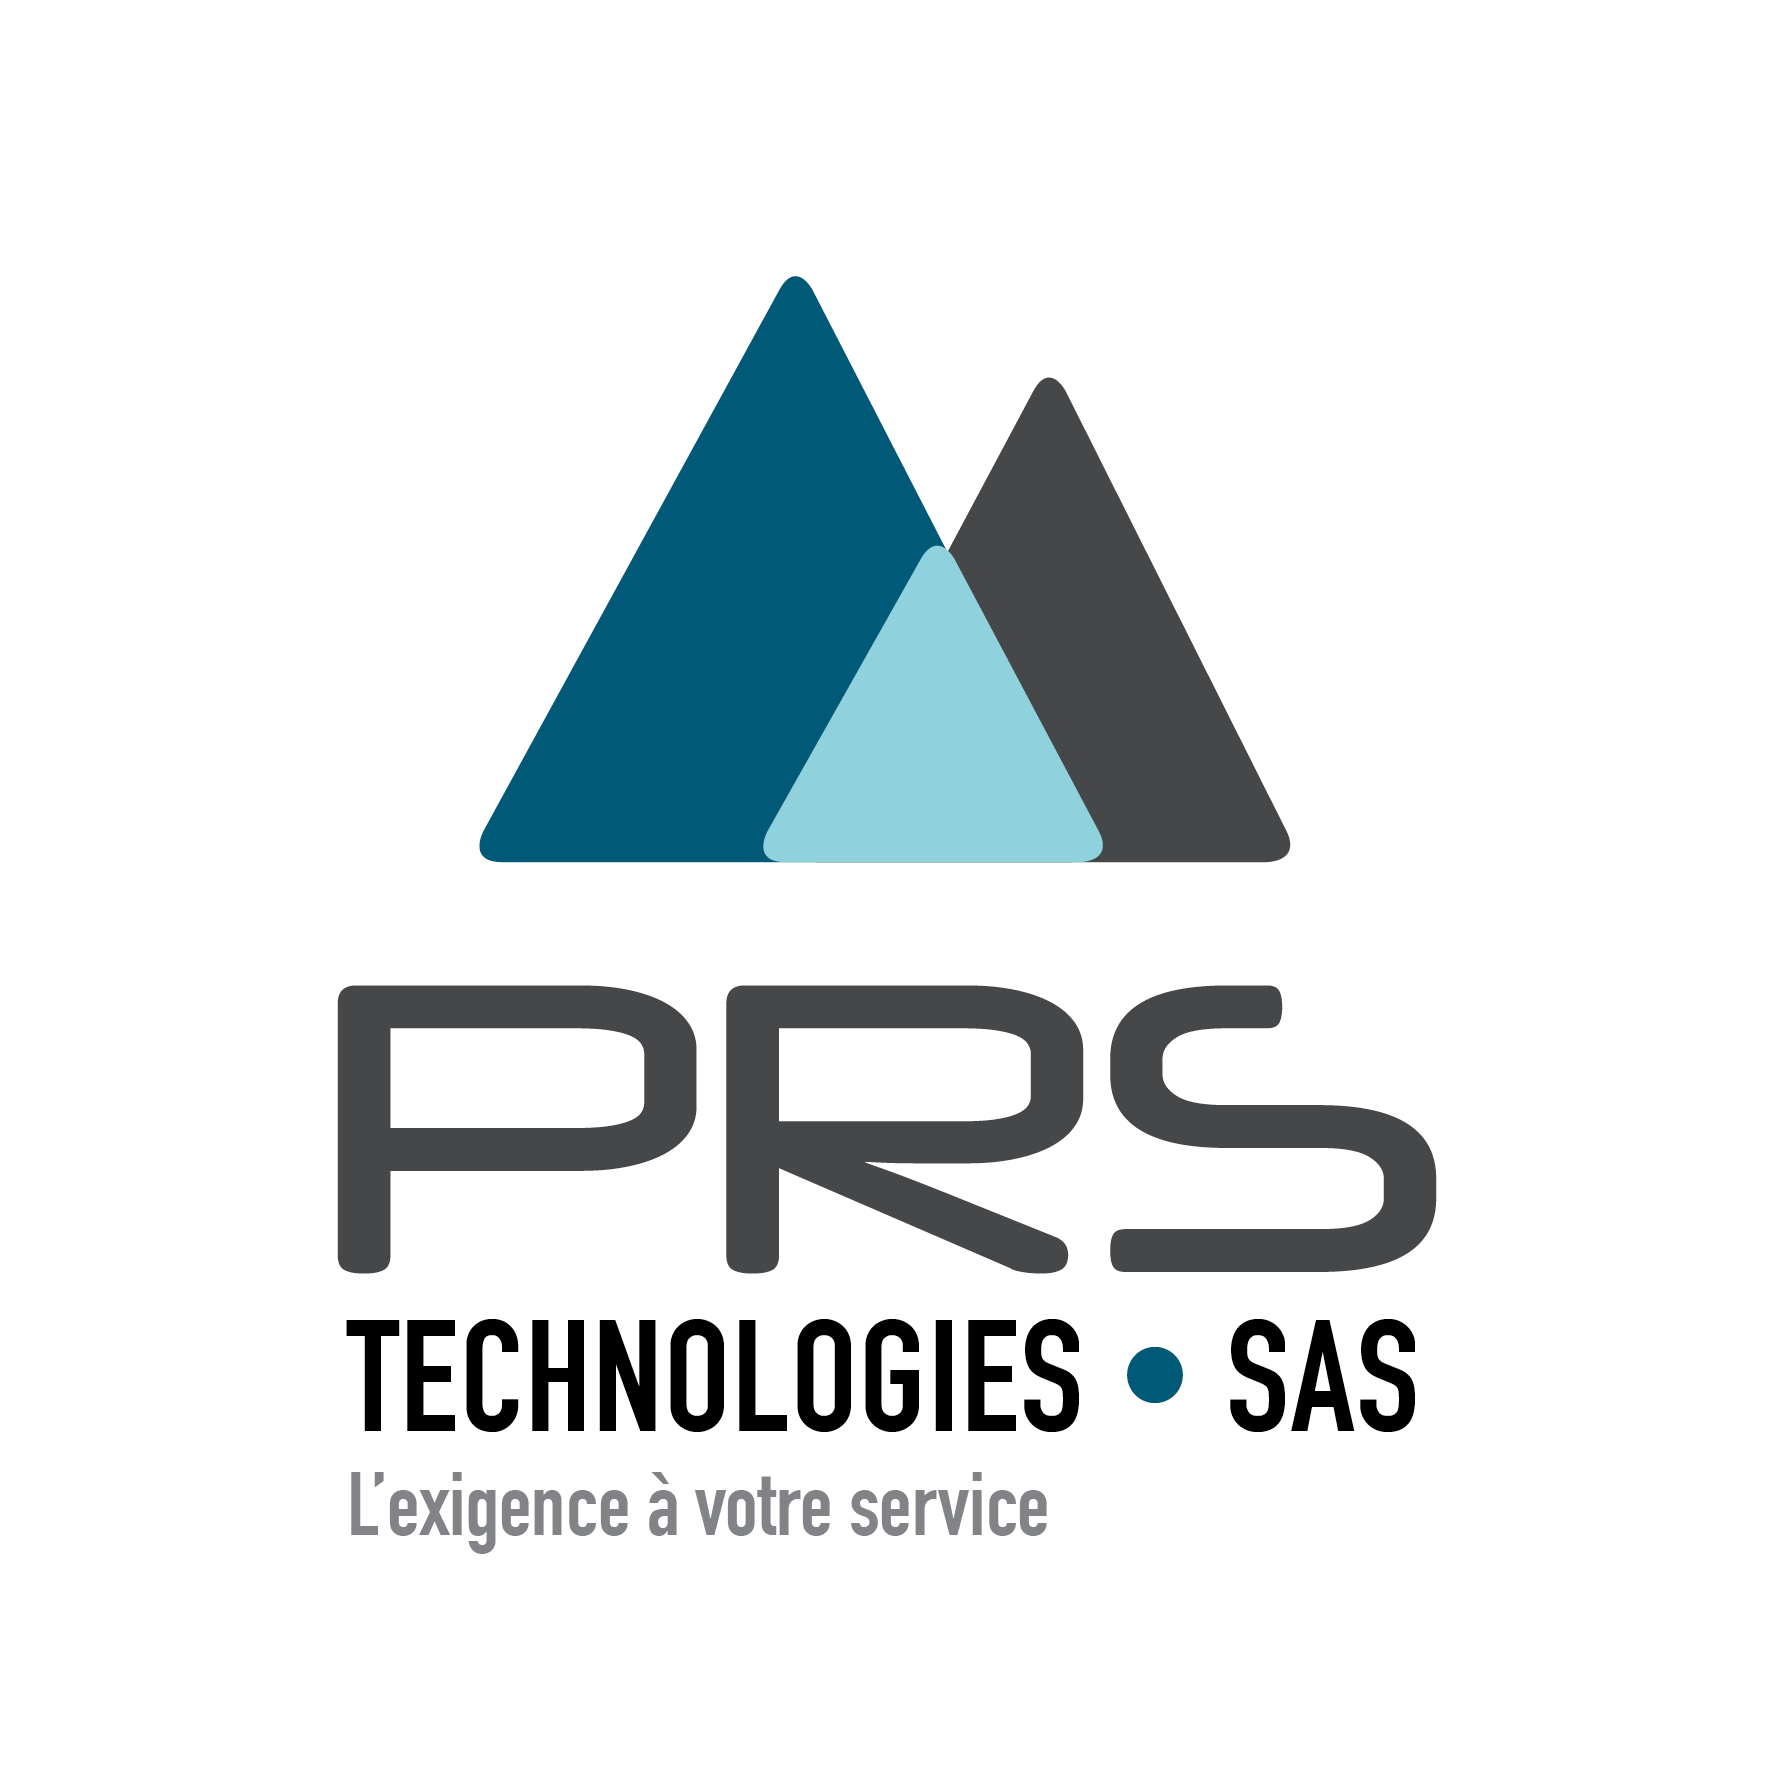 PRS TECHNOLOGIES